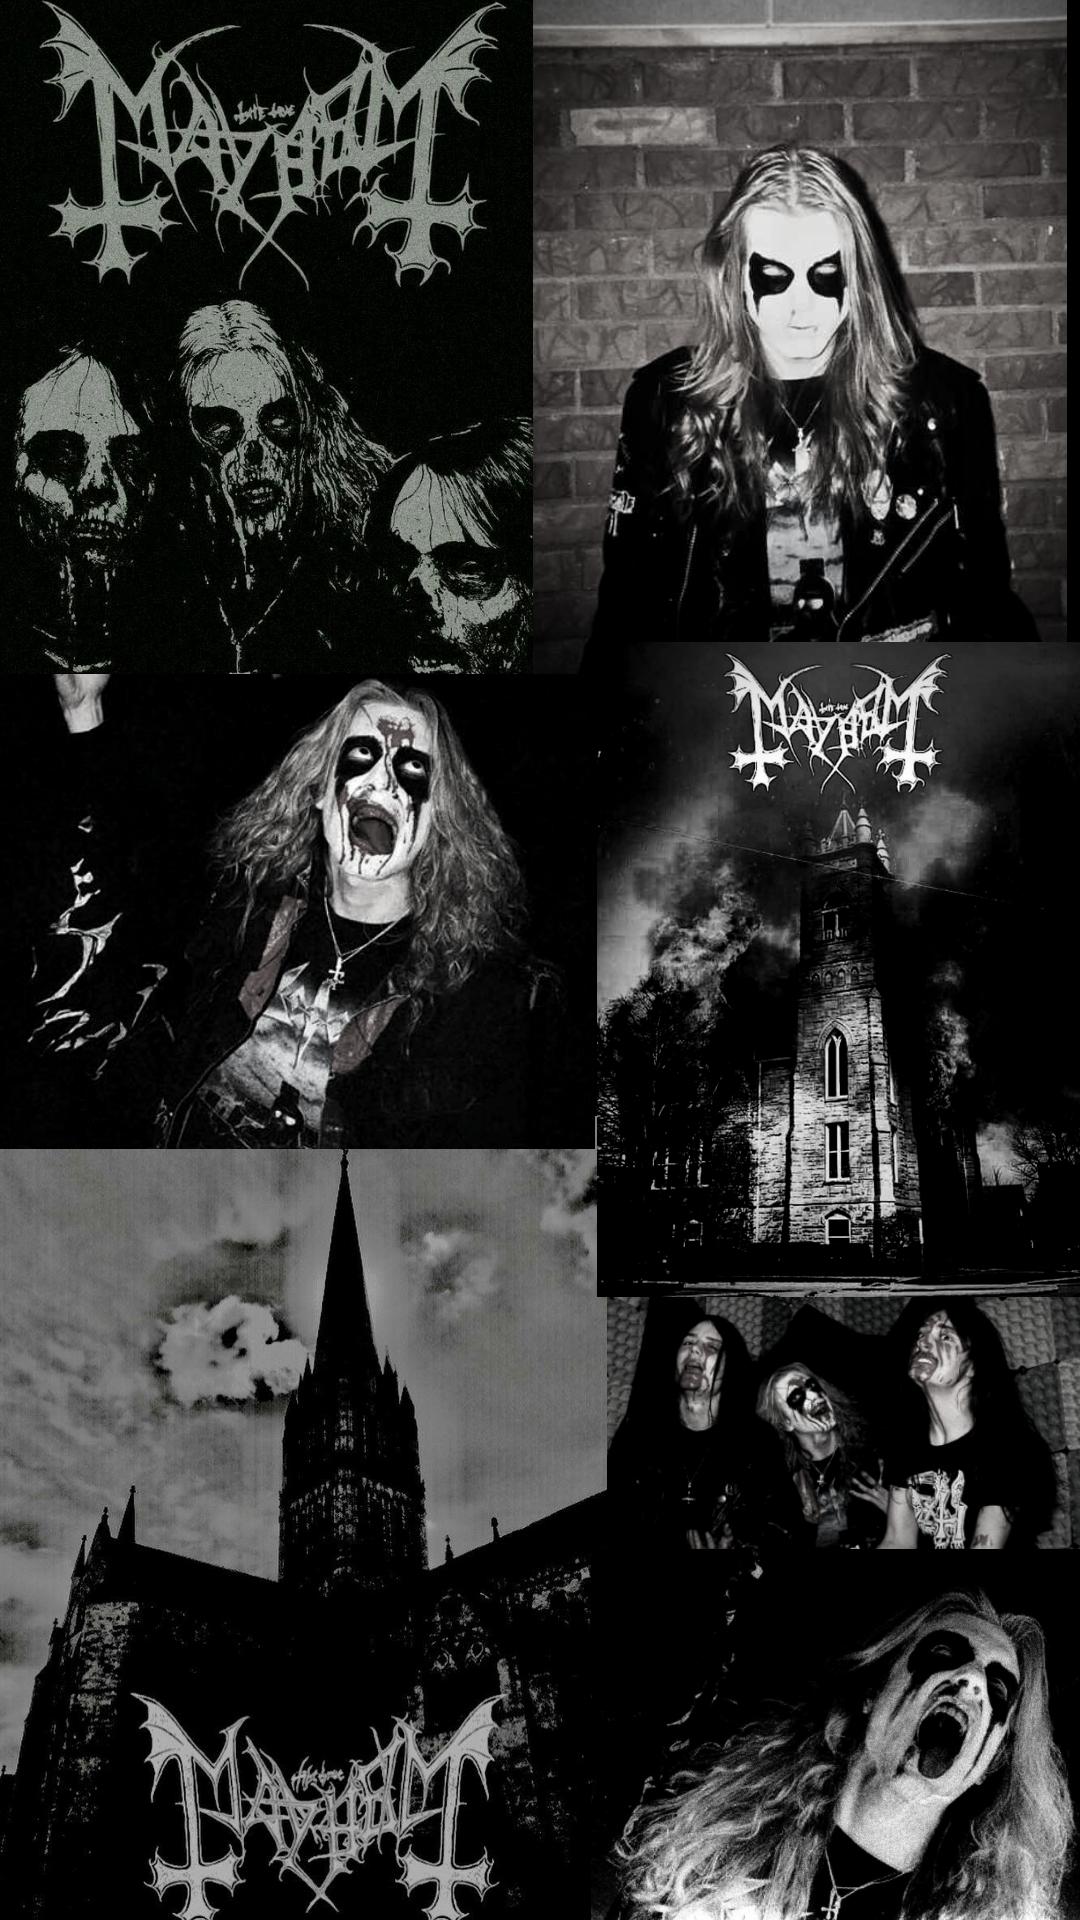 Rock Wallpaper S Black Metal Art Goth Wallpaper Emo Wallpaper